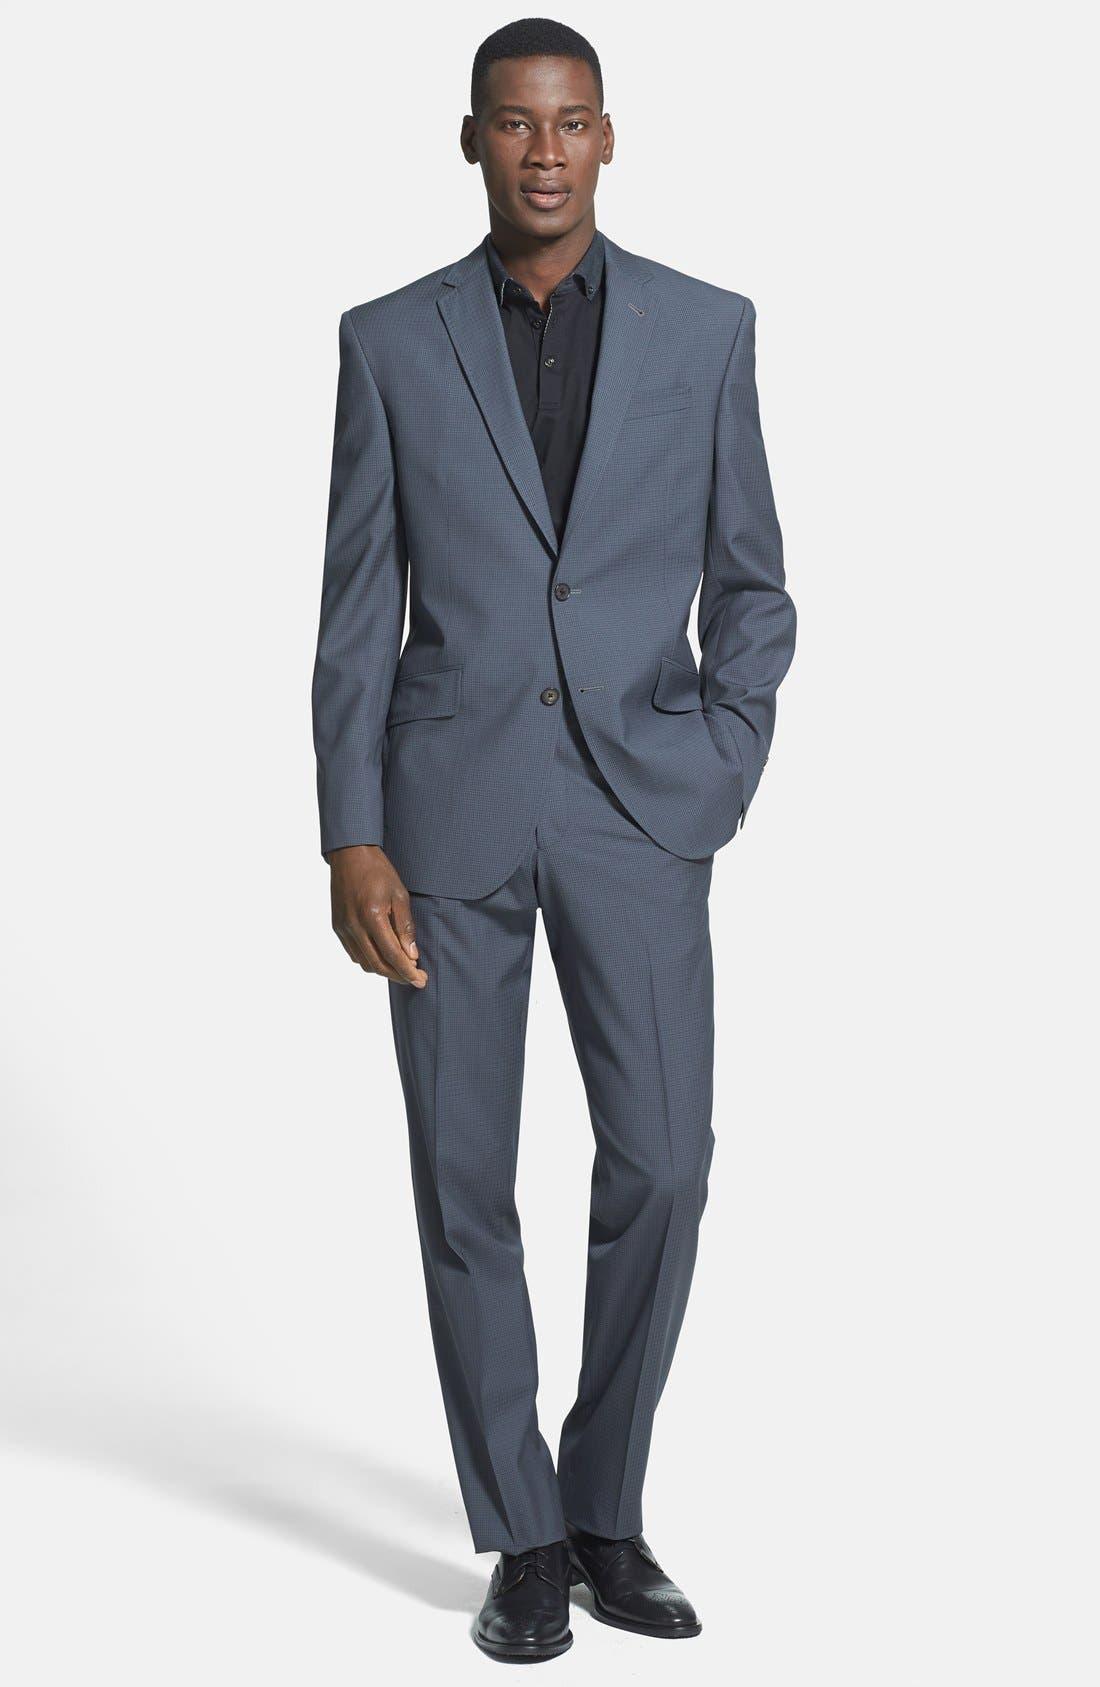 Main Image - Ted Baker London 'Jones' Trim Fit Check Suit (Online Only)